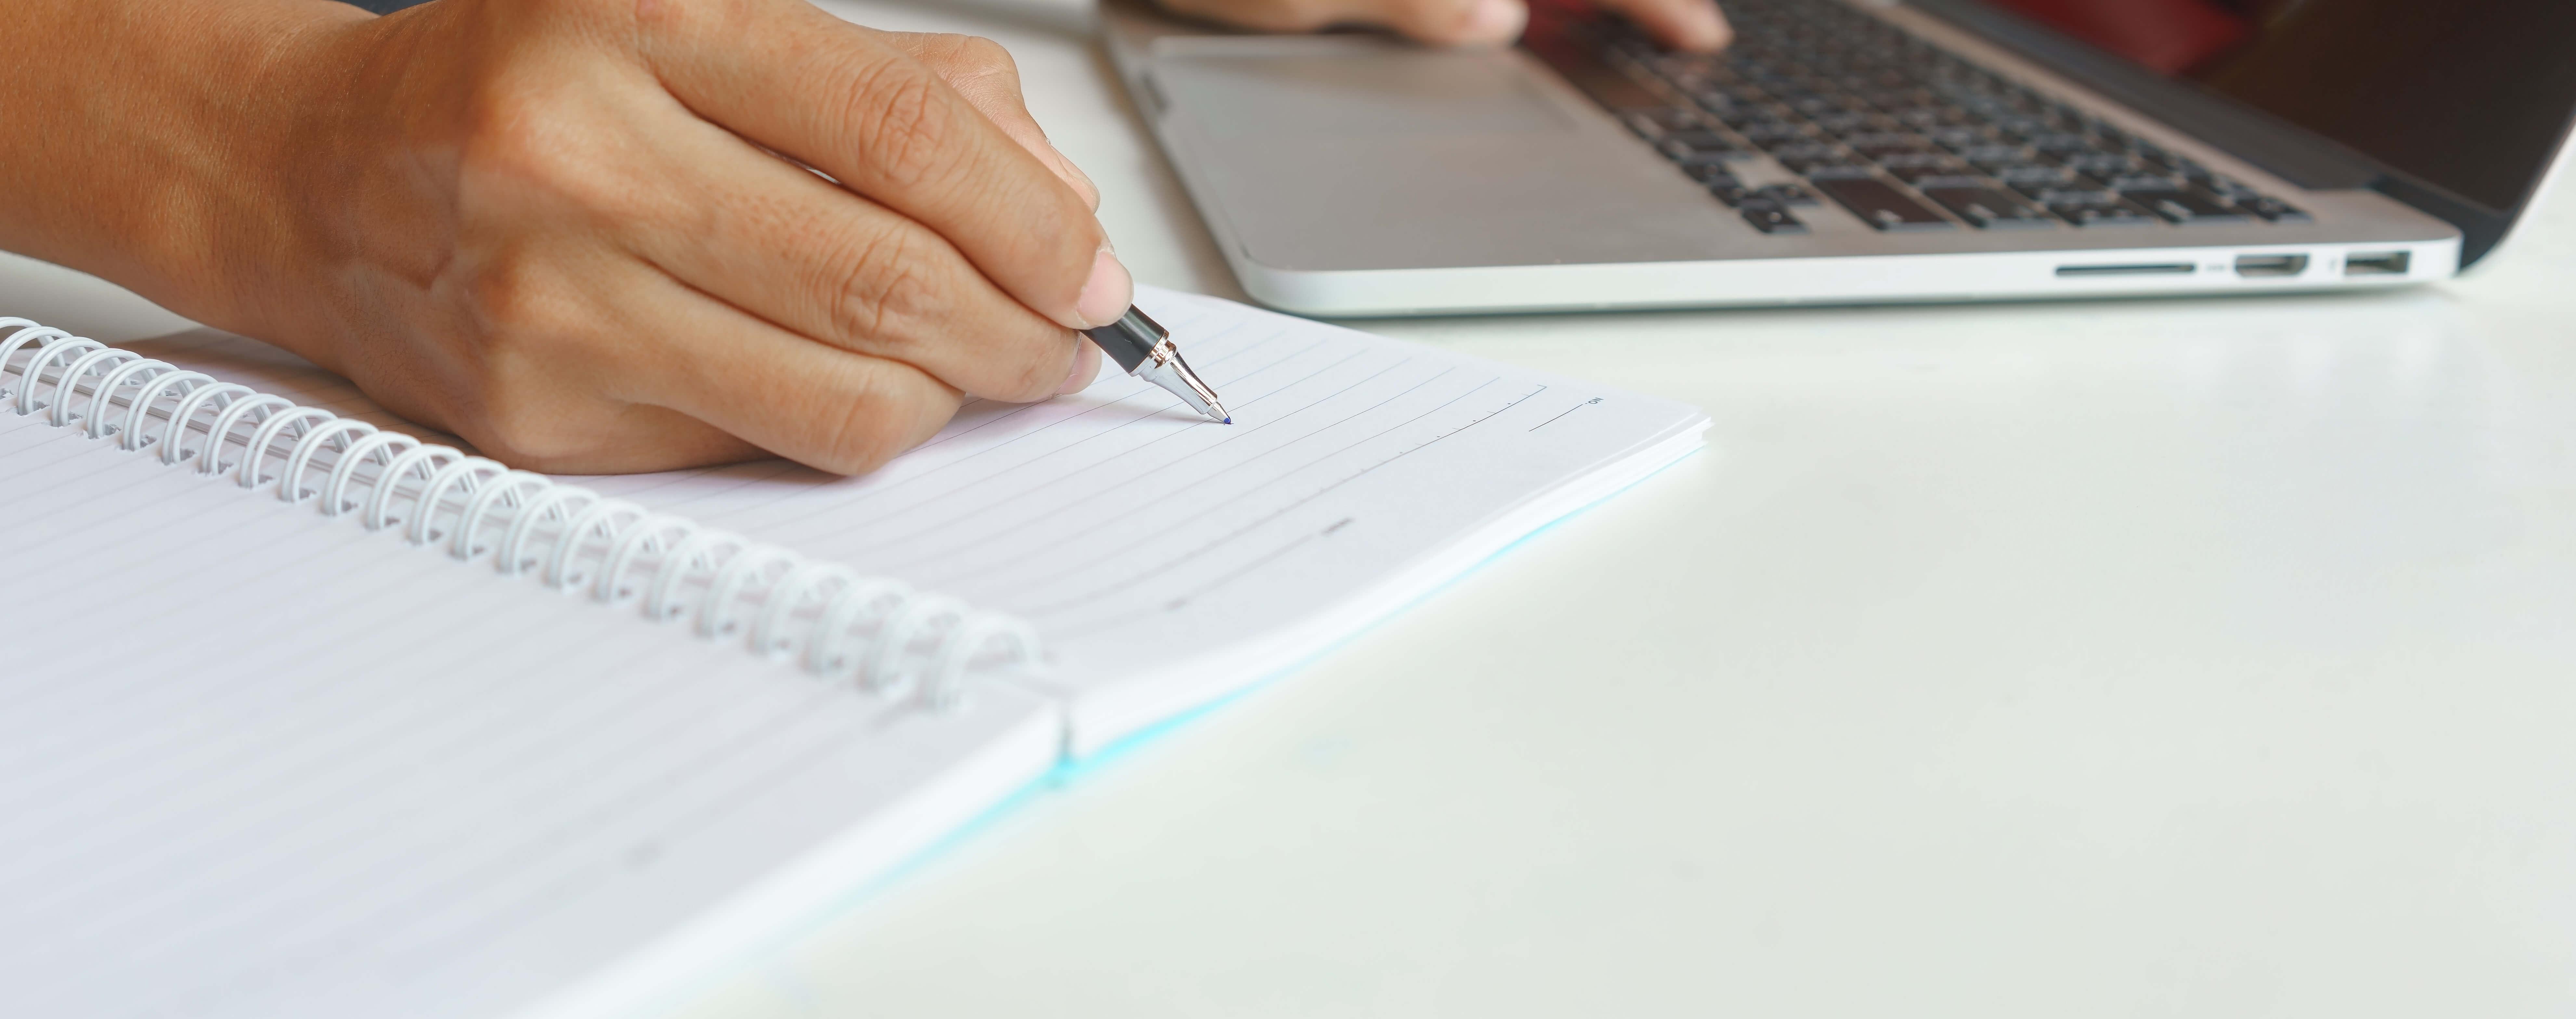 hand pen writing notebook laptop copy